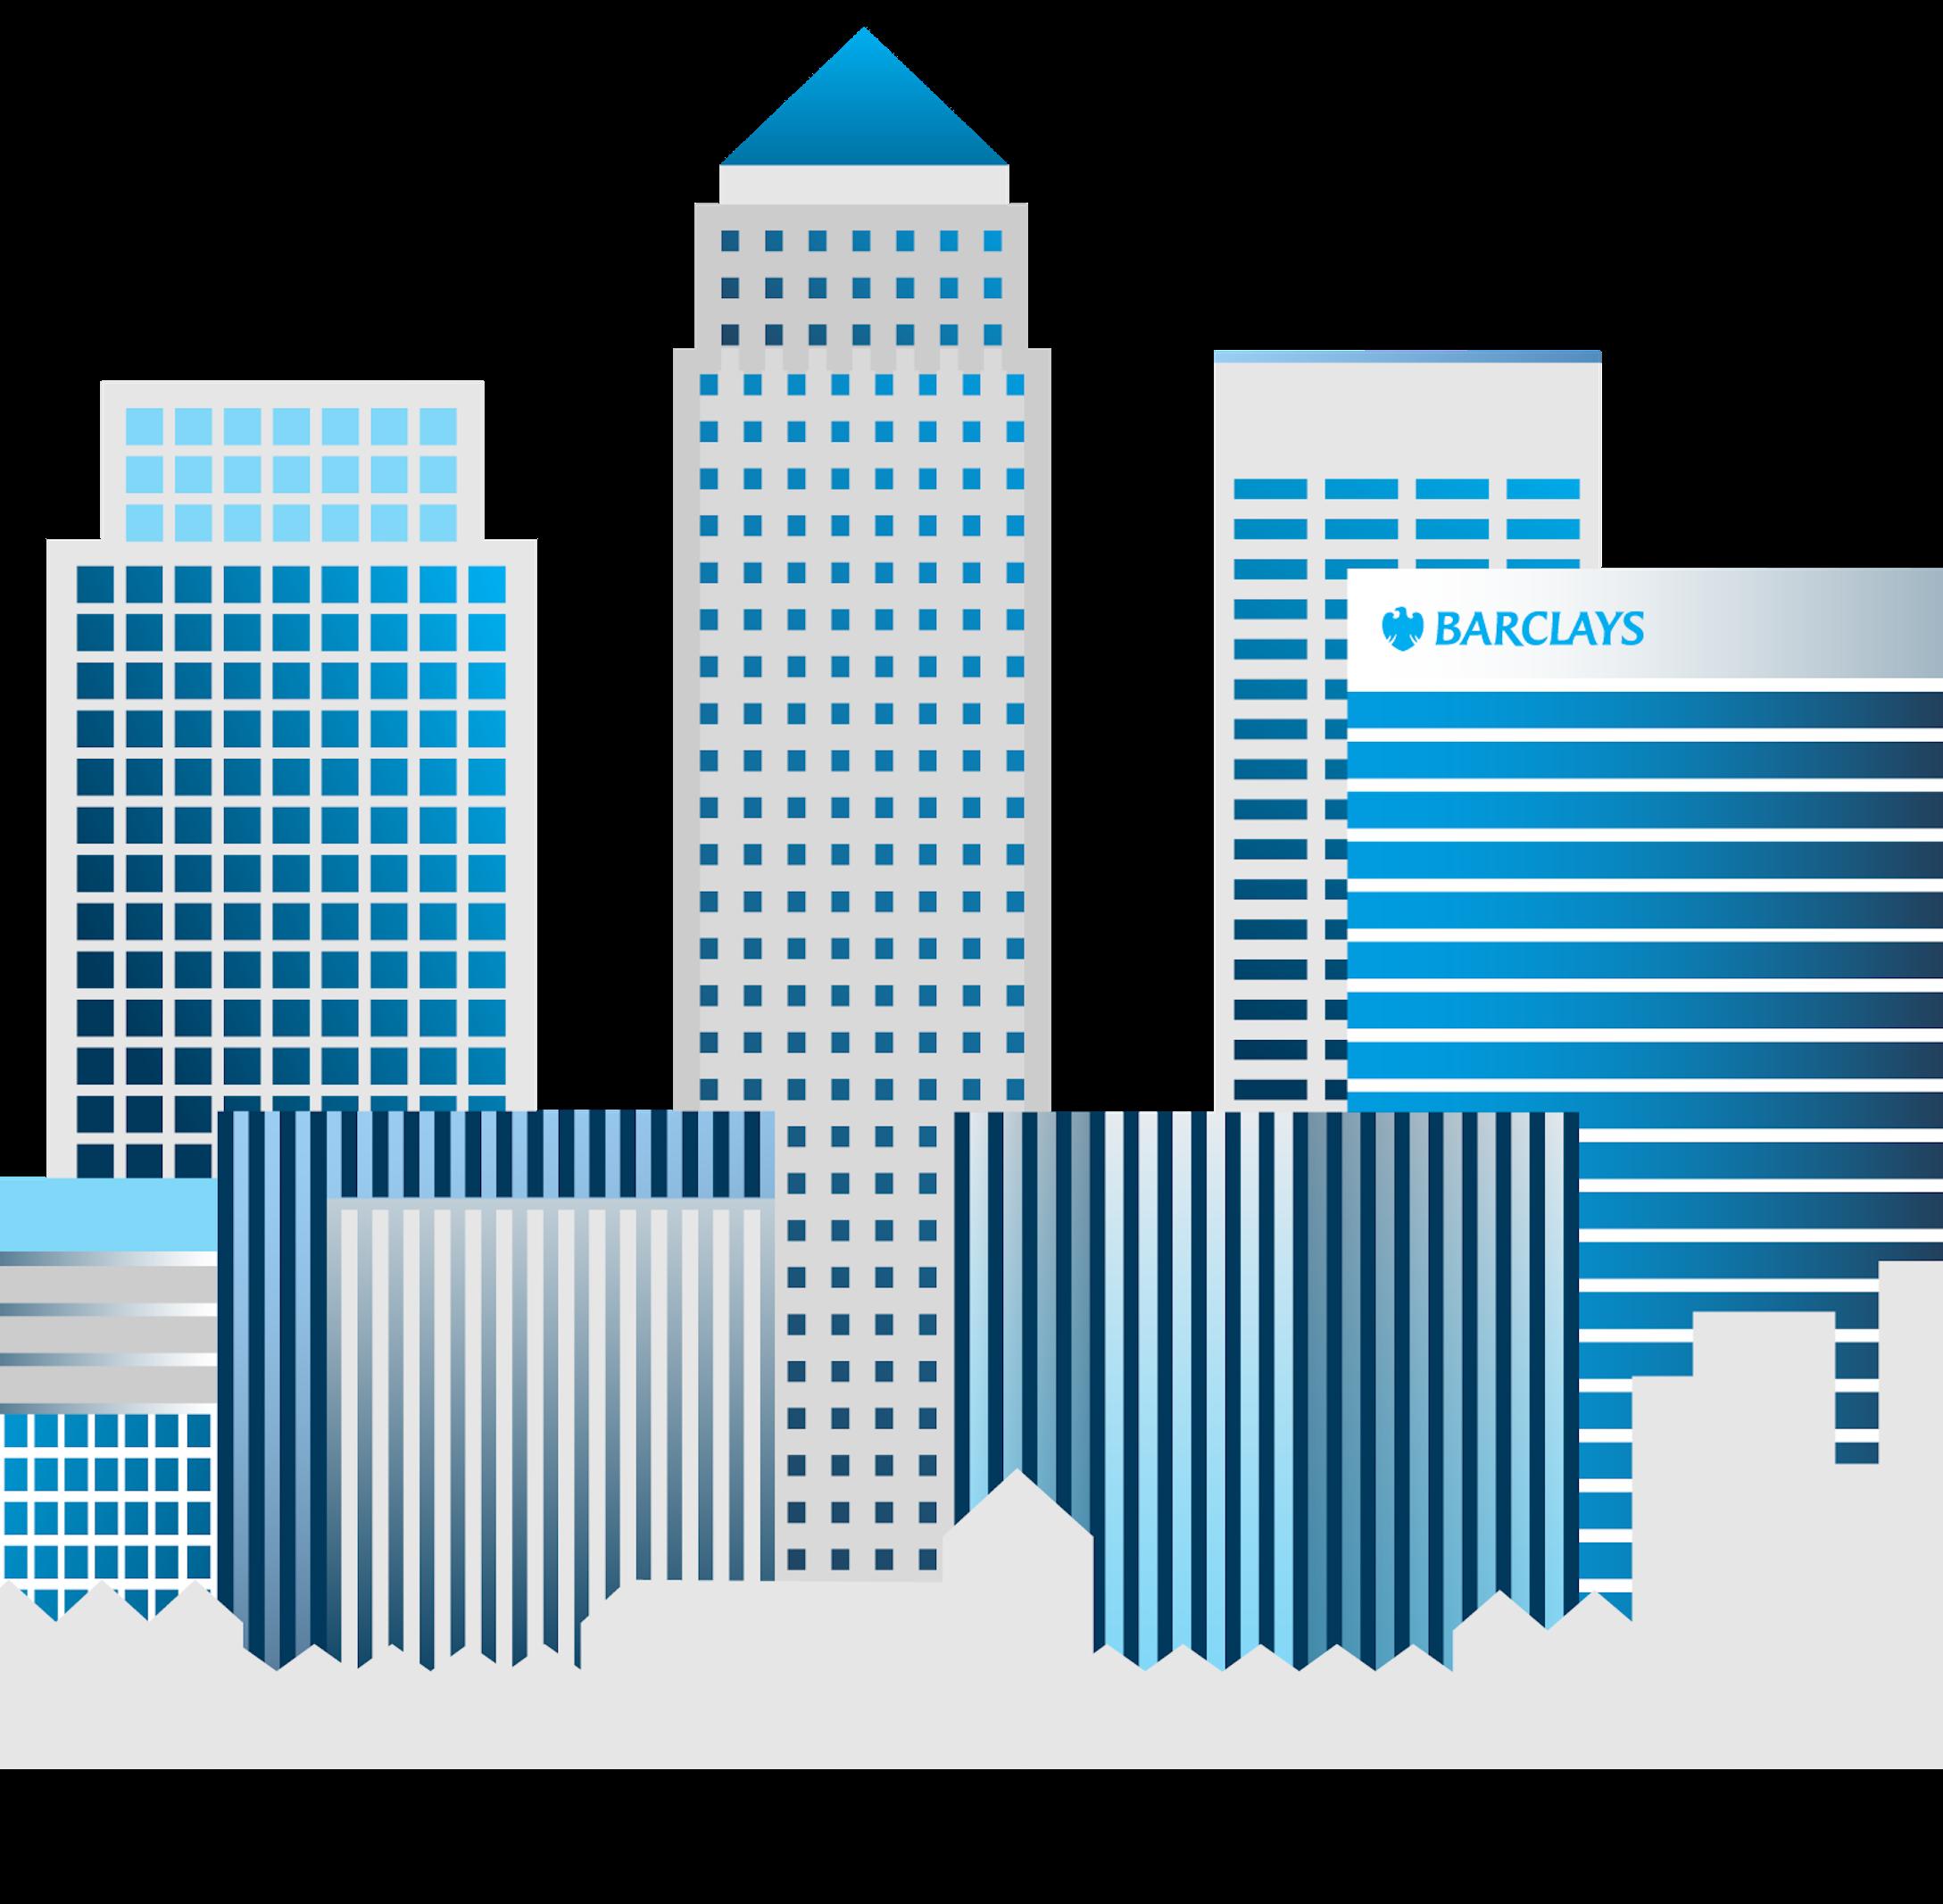 Clipart graduate development program 2018 clipart black and white stock Graduate | Barclays Early Careers and Graduates clipart black and white stock